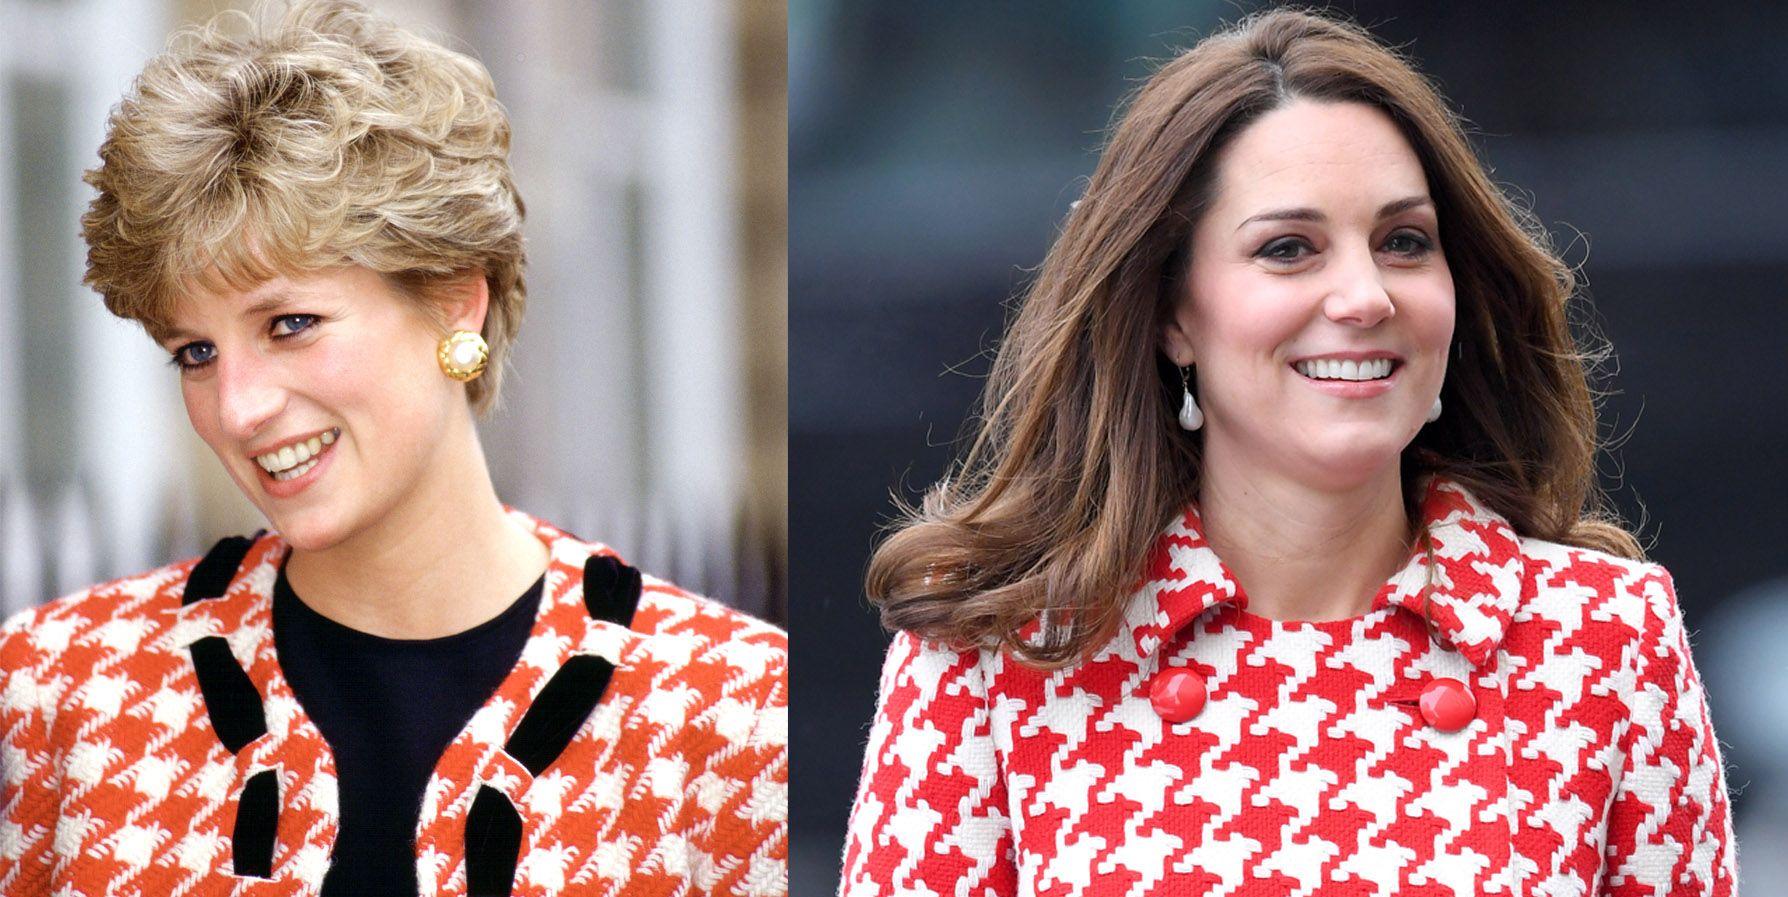 41 Times The Duchess of Cambridge Dressed Like Princess Diana